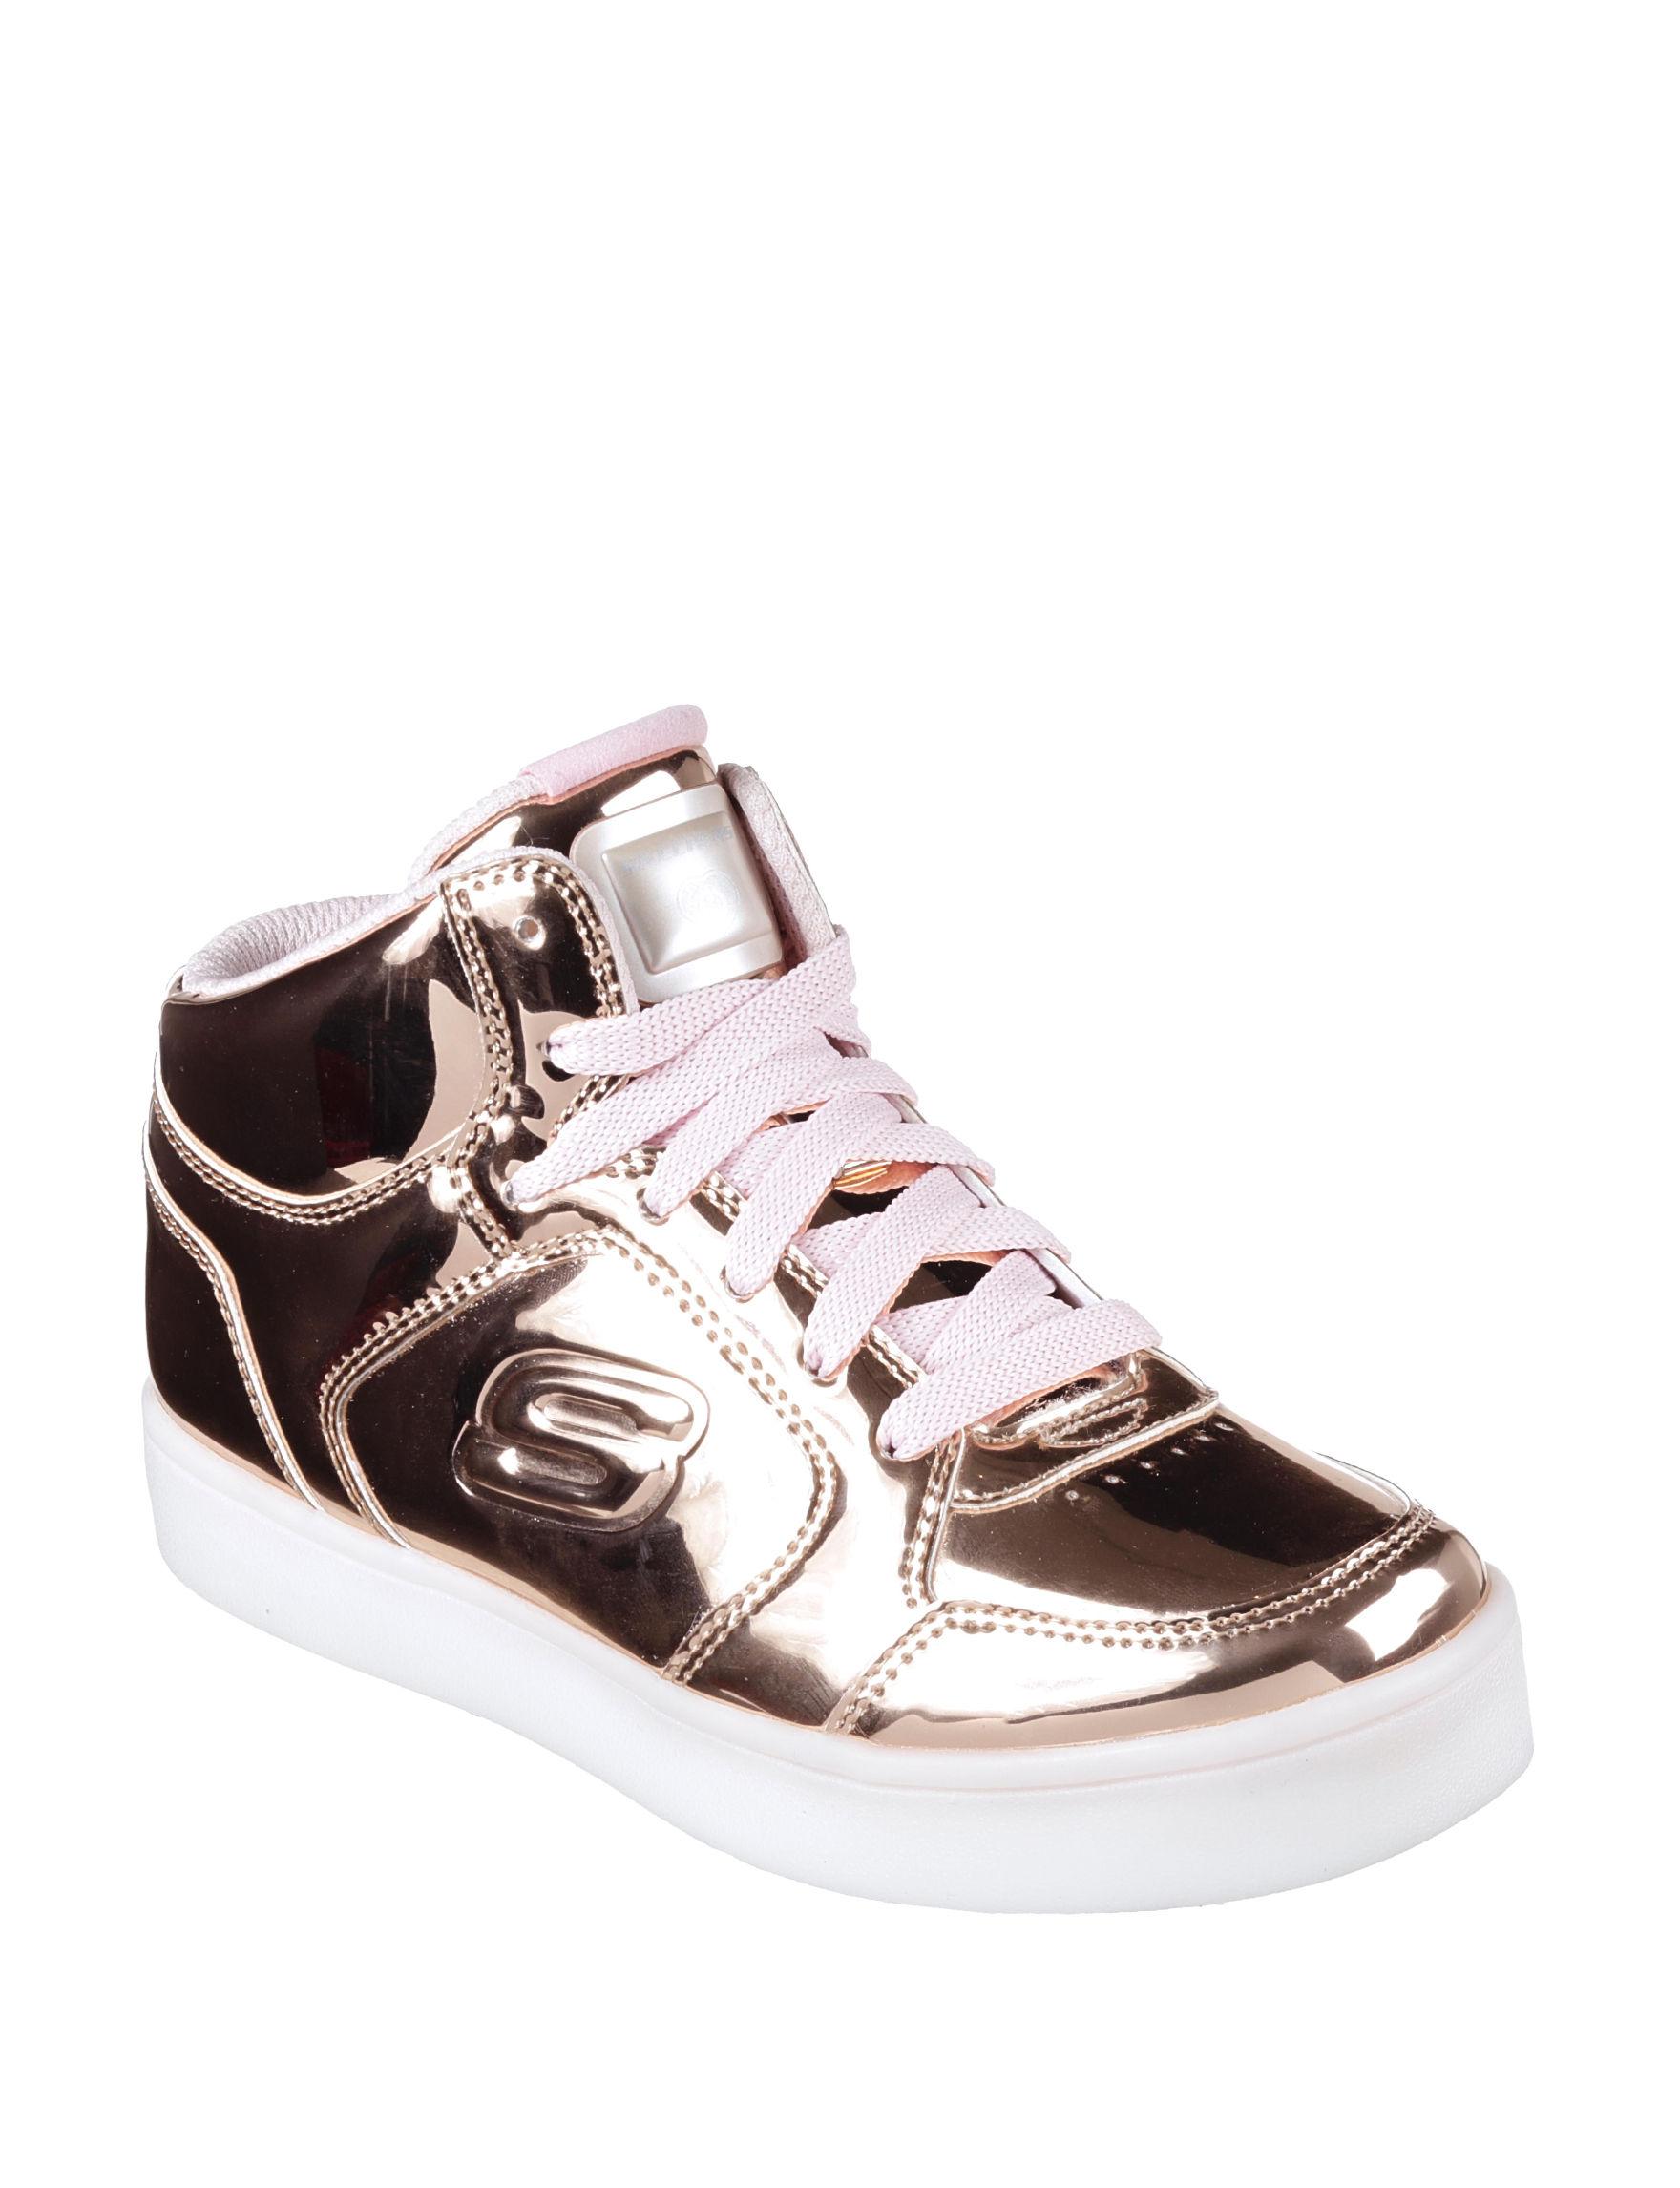 Skechers Rose Gold